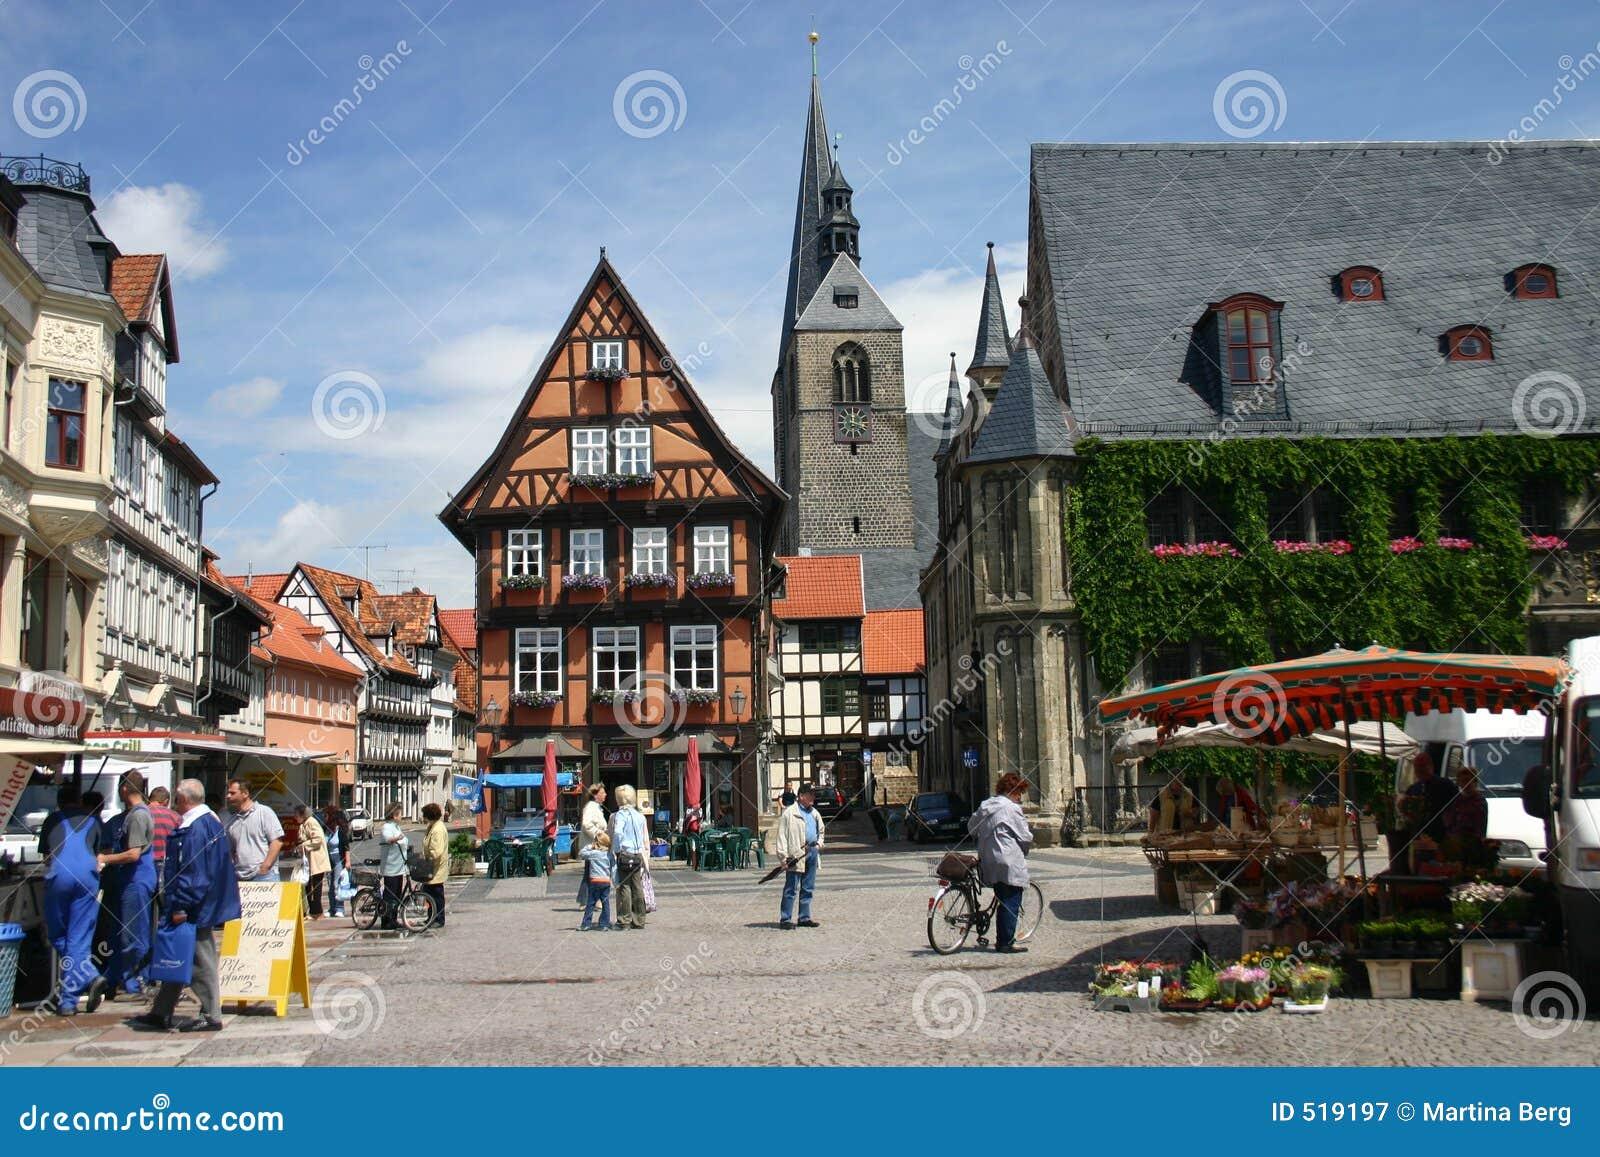 Market place Quedlinburg